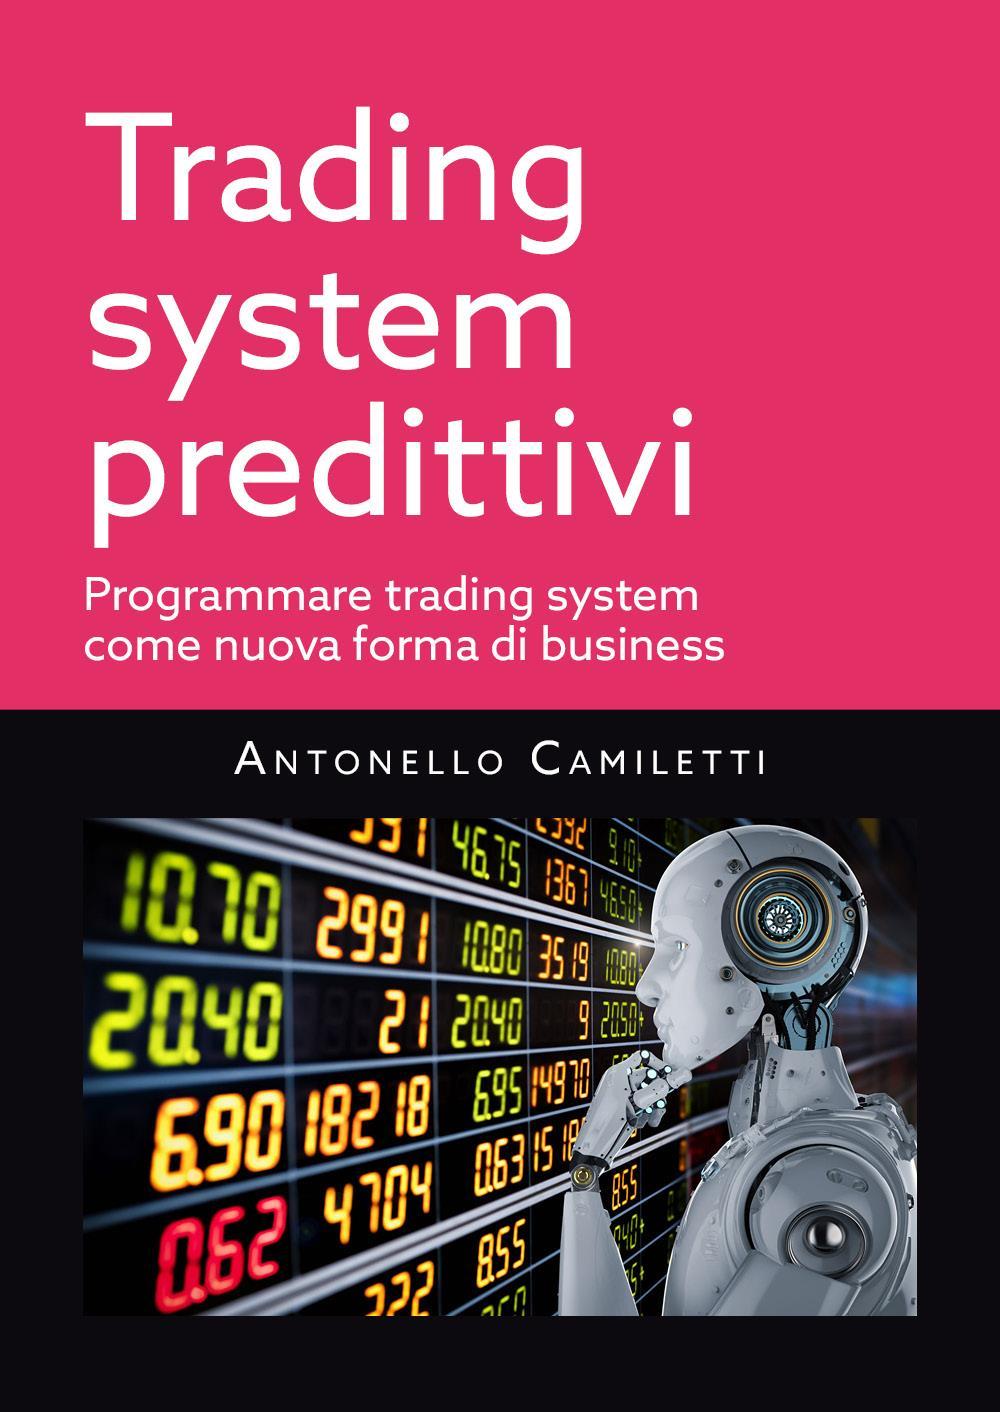 Trading system predittivi